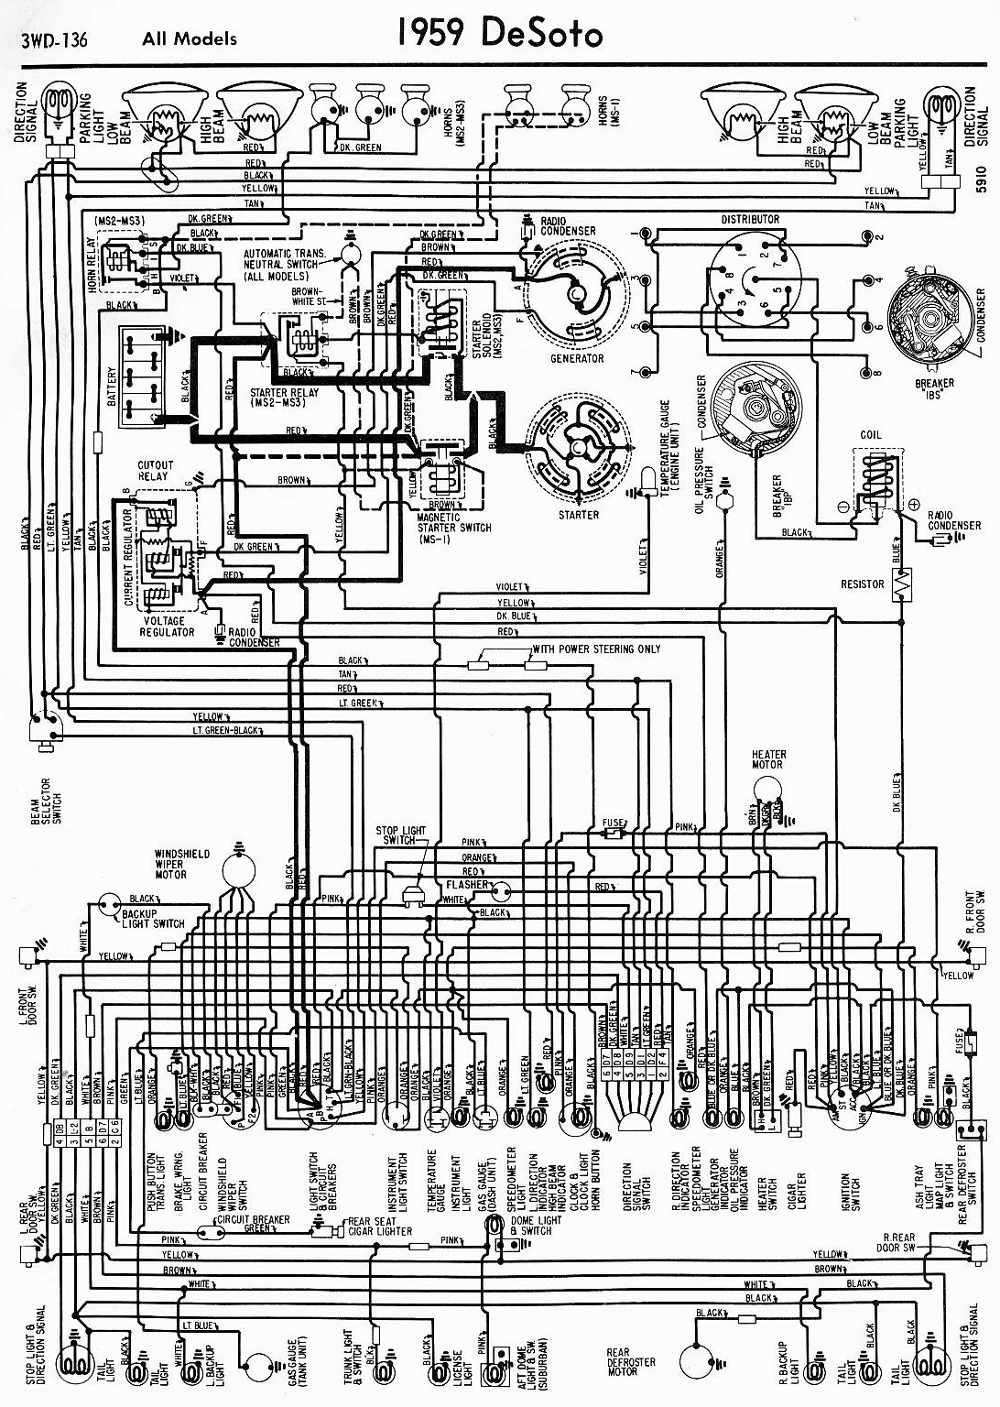 Wiring Diagram 08 Gsxr 1000 Shift Light Trusted Diagrams 2006 1960 Desoto House Symbols U2022 100 Schematics